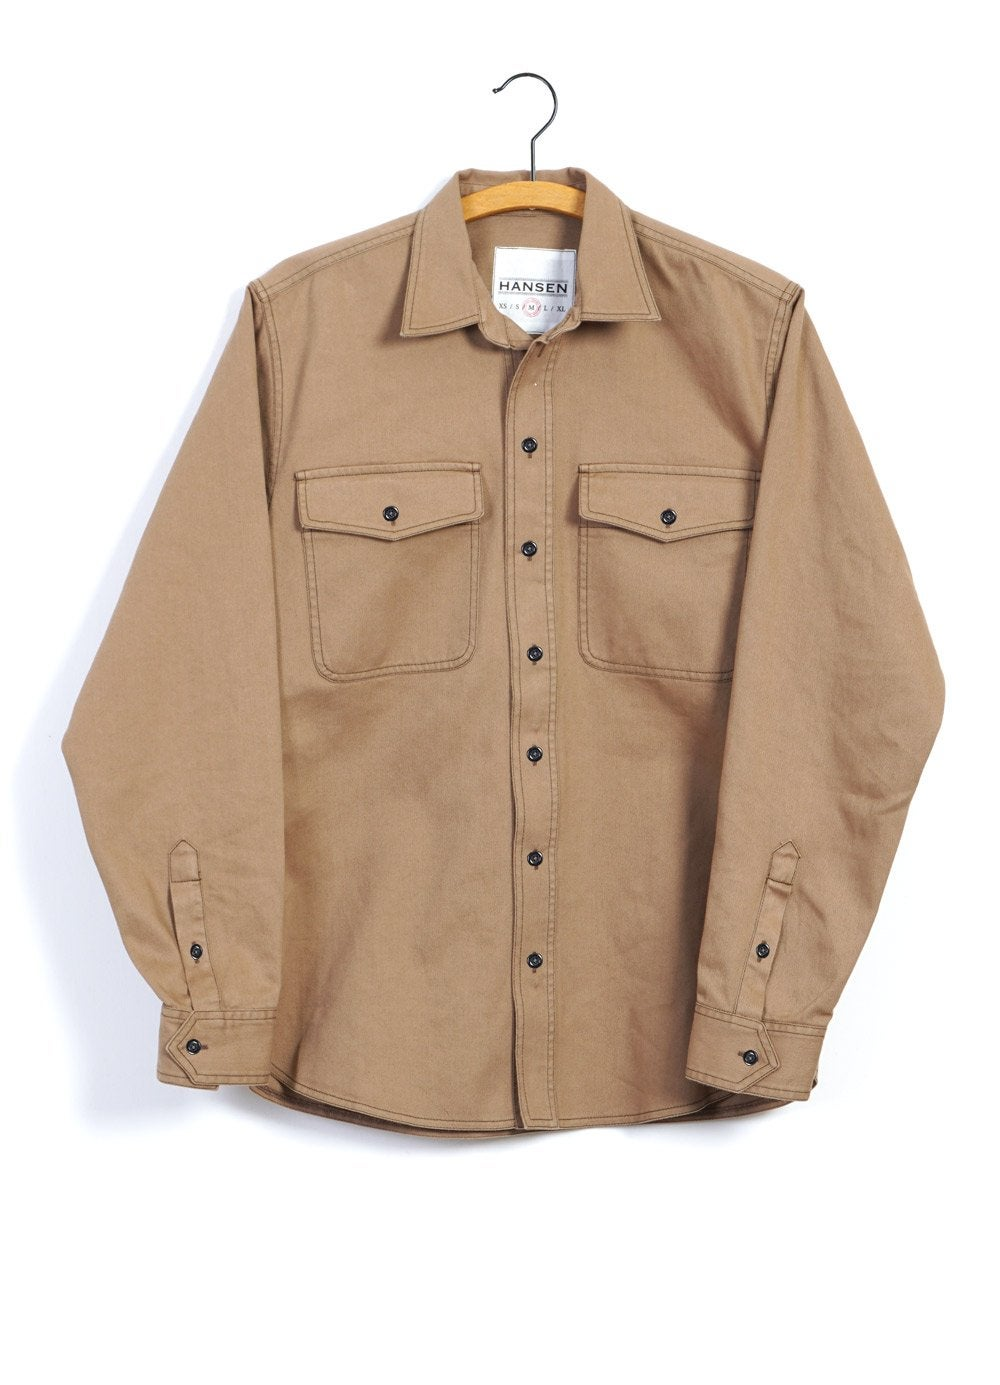 Hansen Garments VILLADS | Loose Fit Overshirt | var. colors